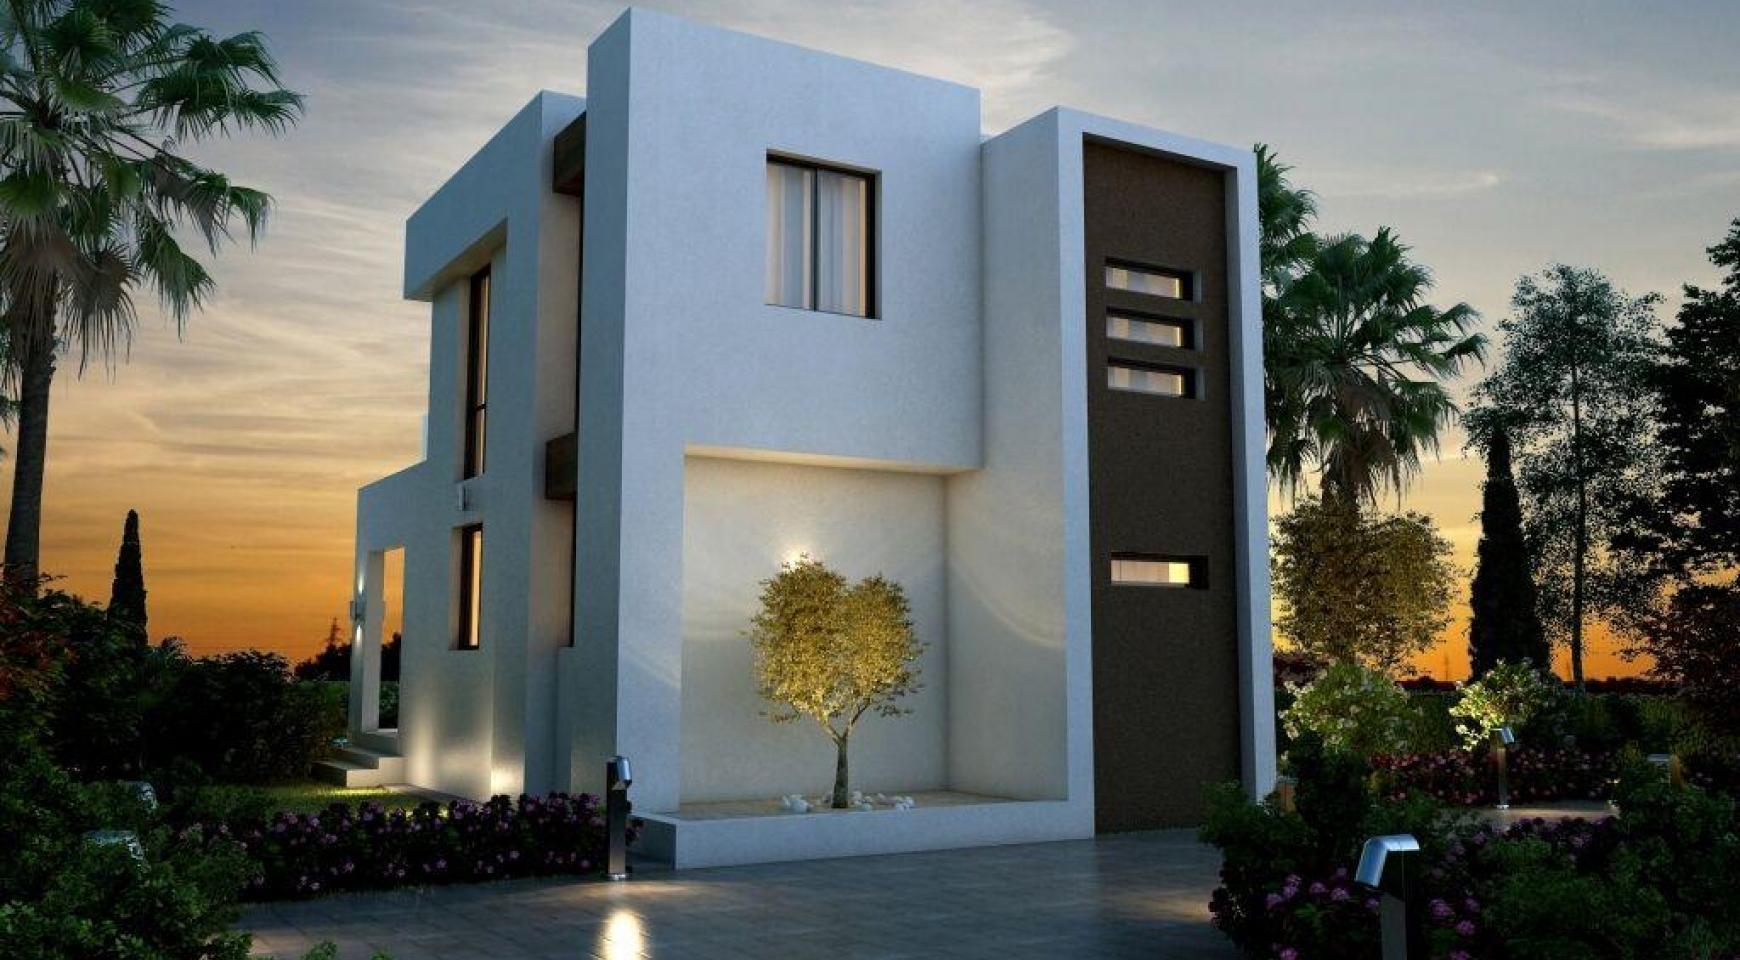 Modern 3 Bedroom Villa in a Complex near the Beach - 5